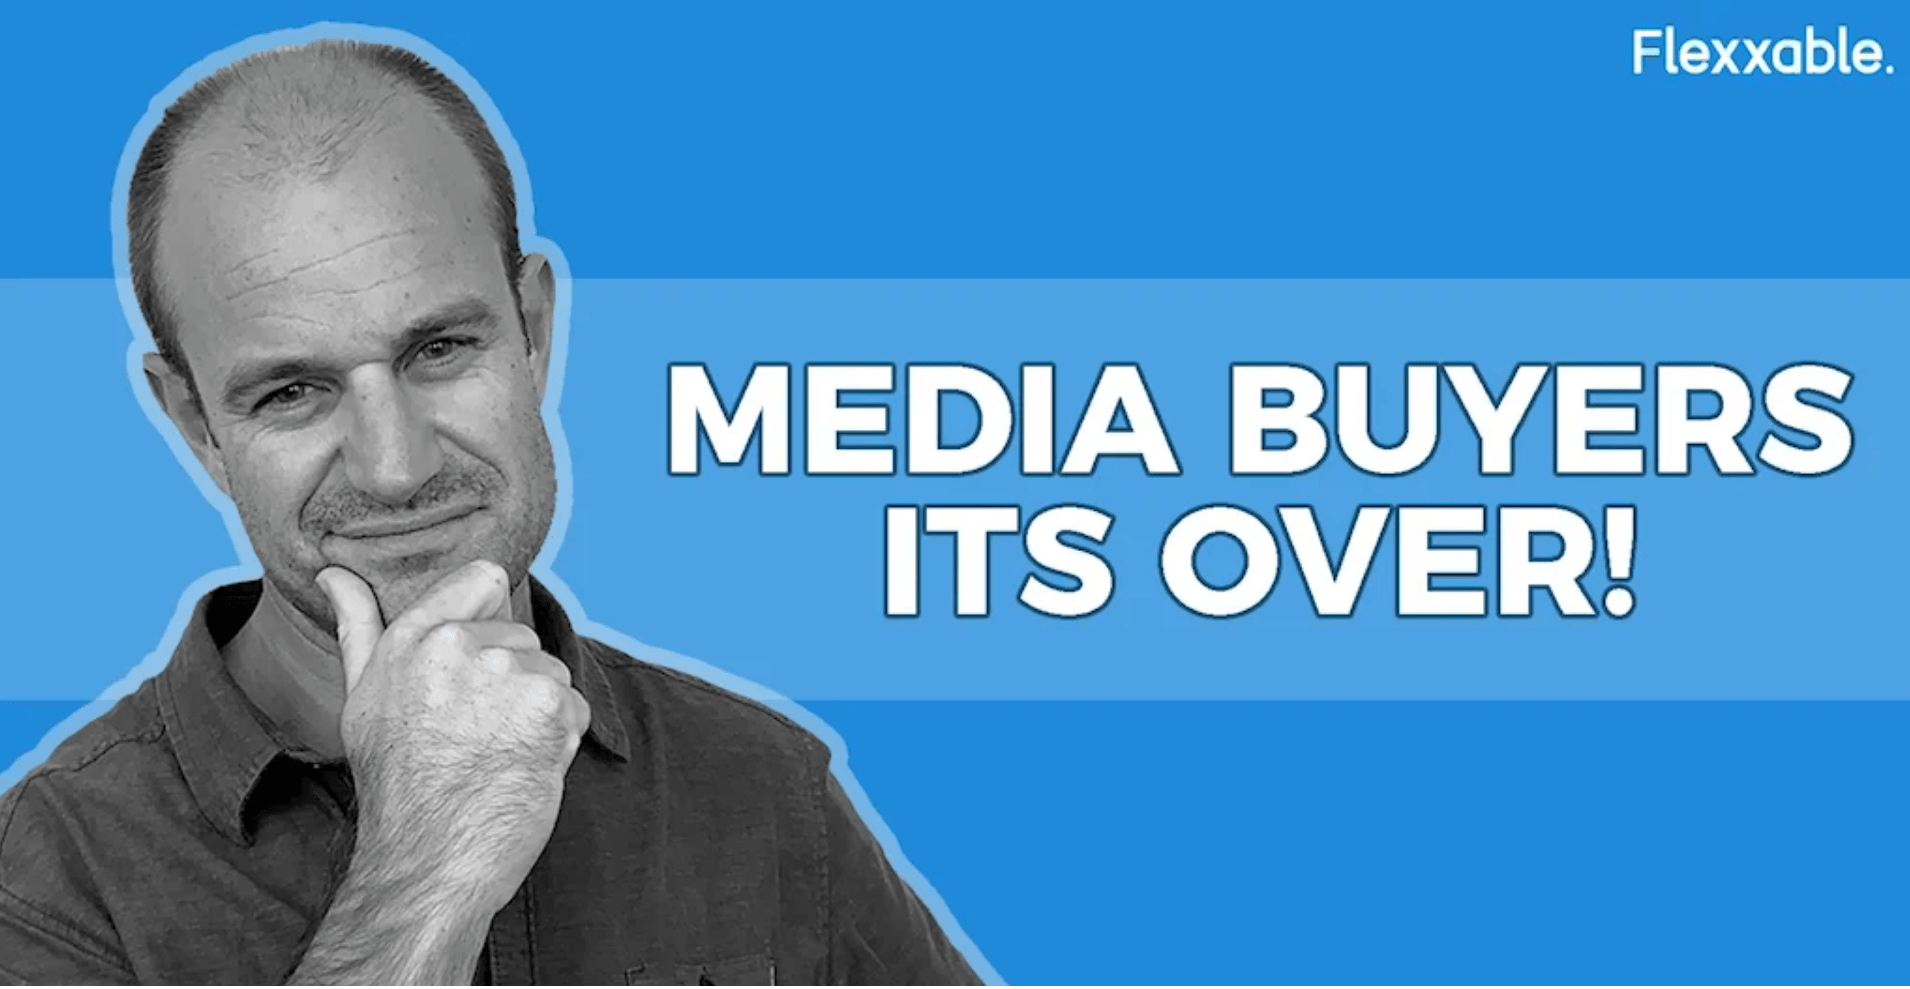 media buyers it's over